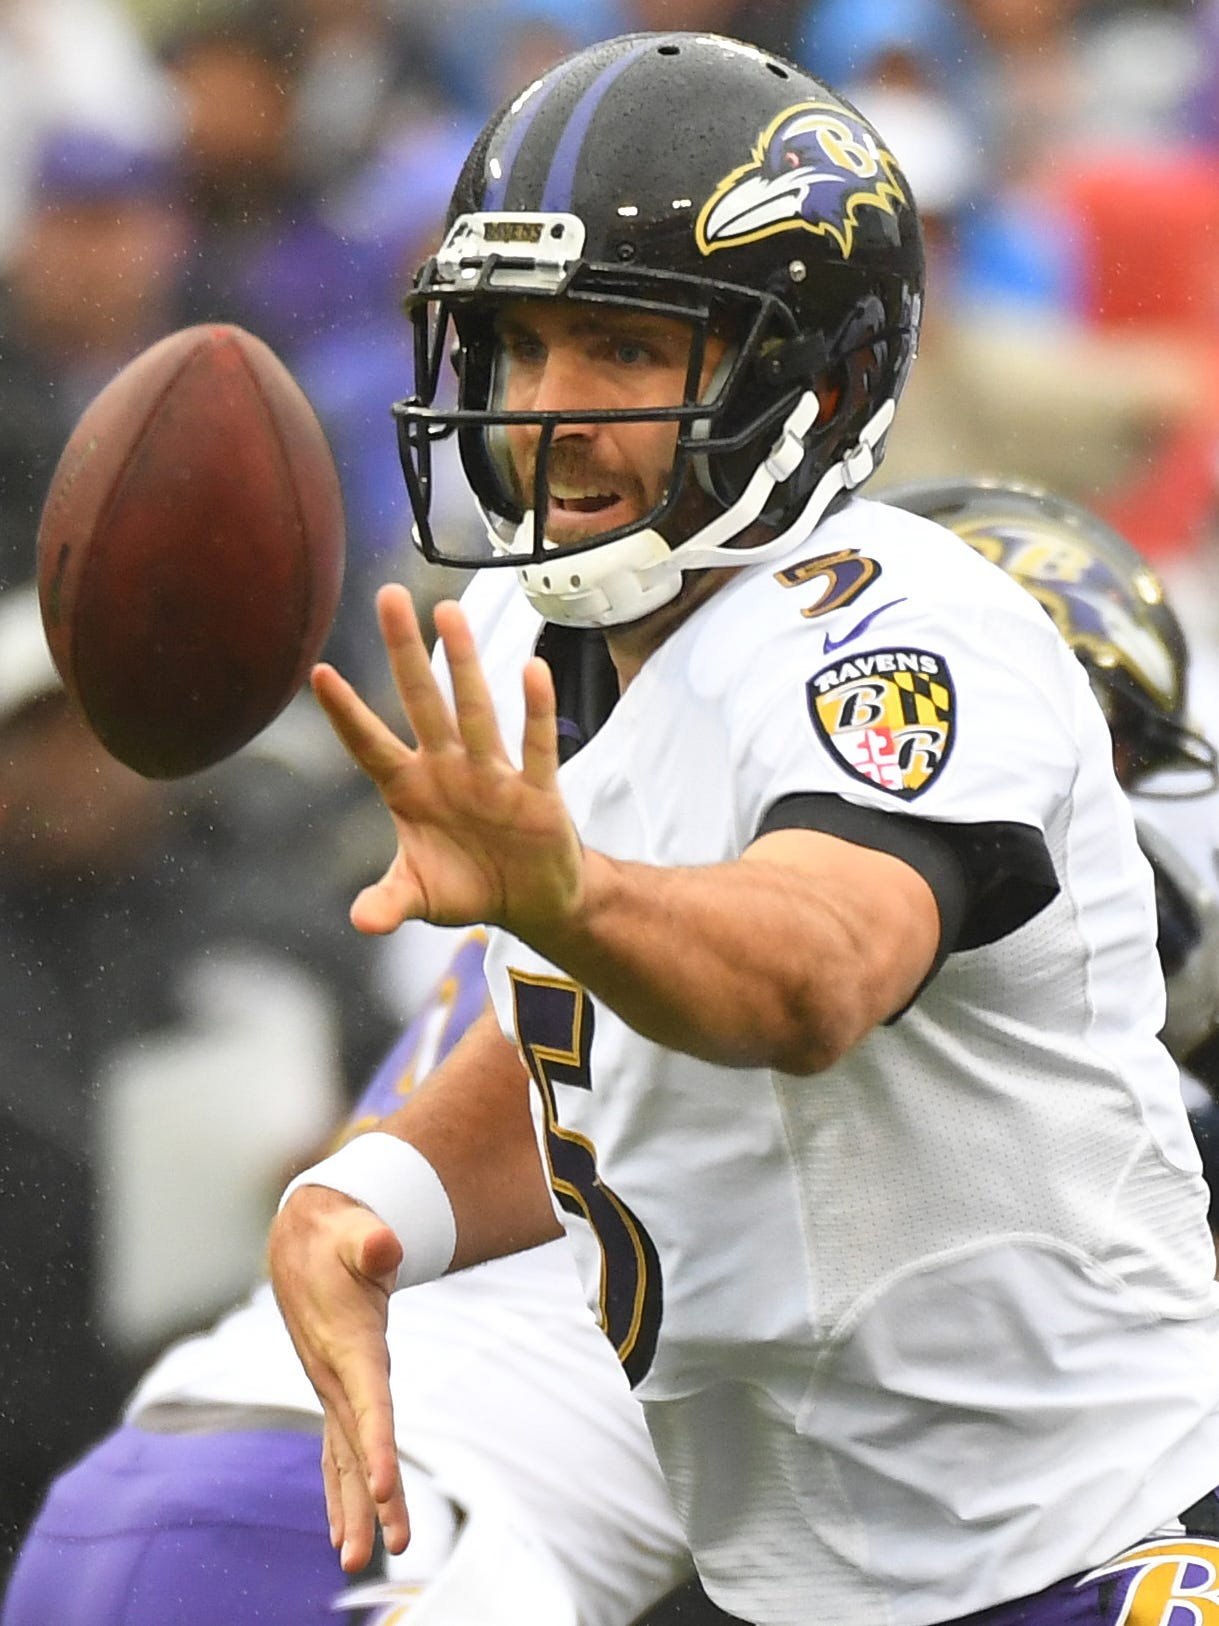 Ravens QB Joe Flacco seems likely to be wearing a new uniform in 2019.